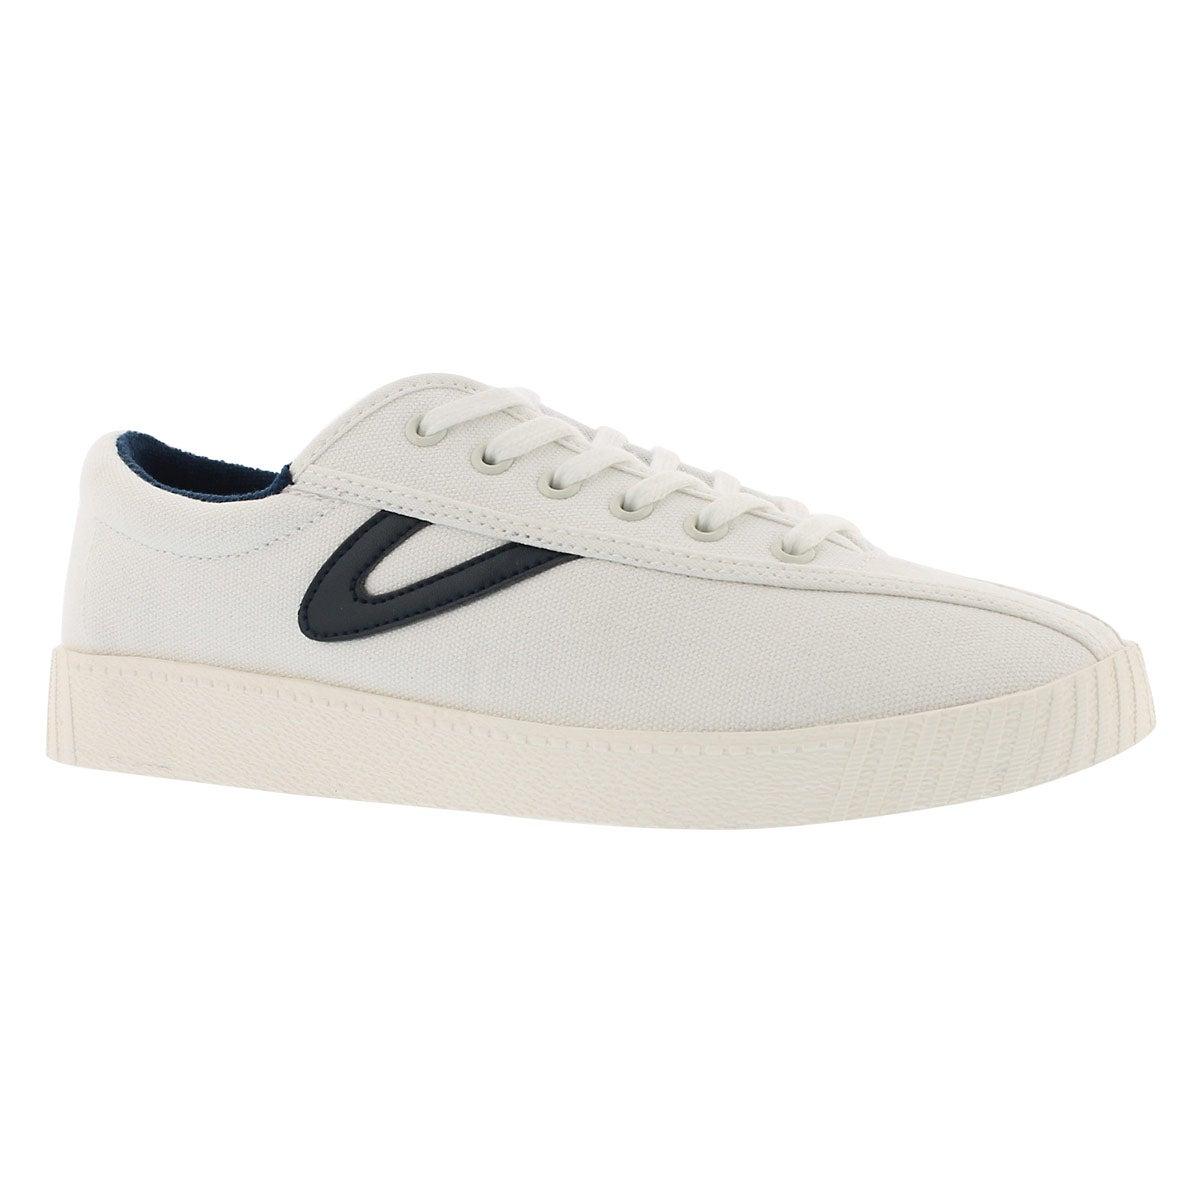 Lds Nylite Plus white/night sneaker